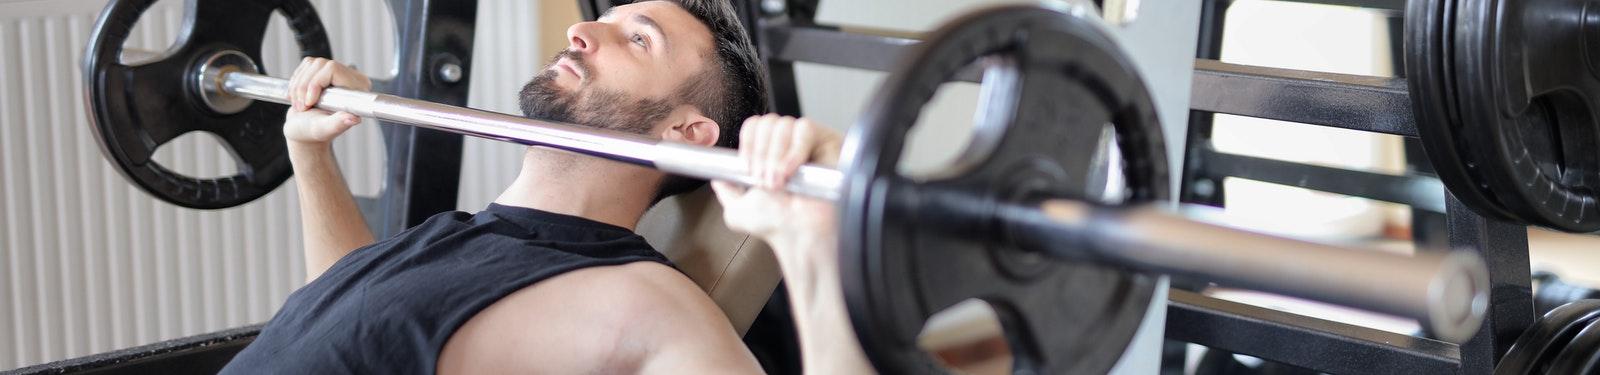 desarrollar fuerza muscular